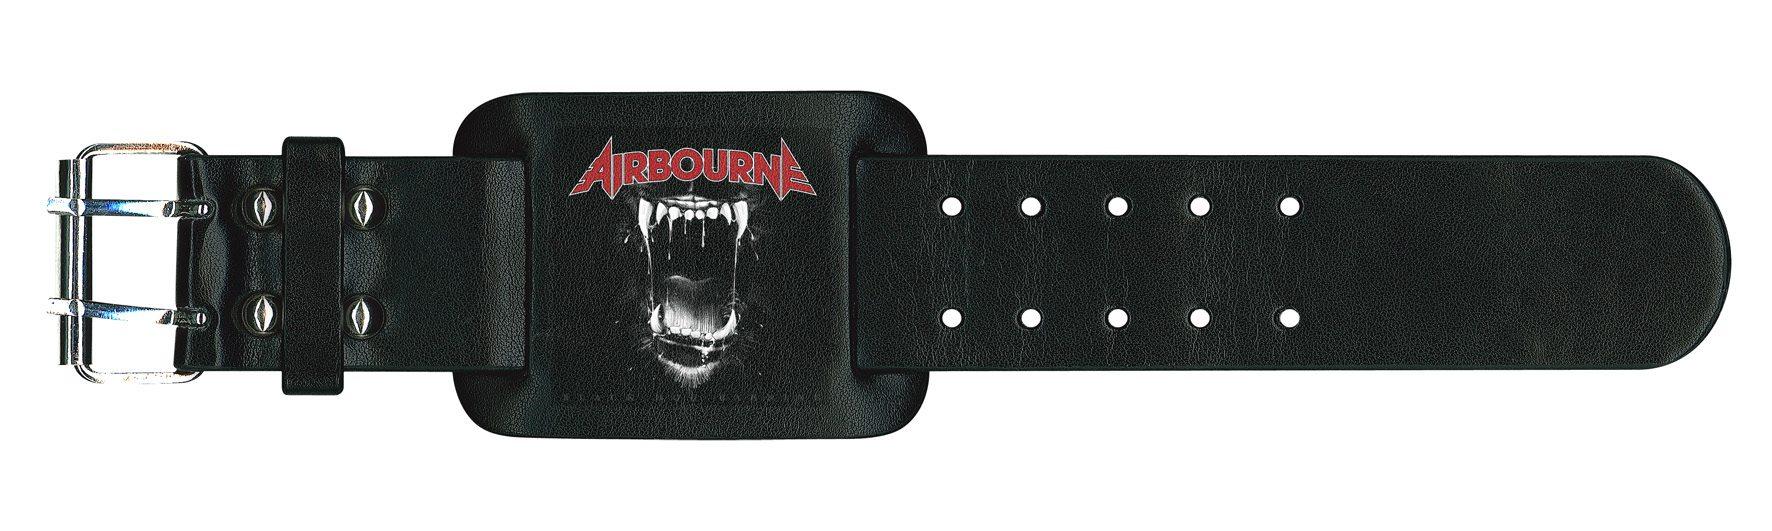 Airbourne Leather Wristband Black Dog Barking